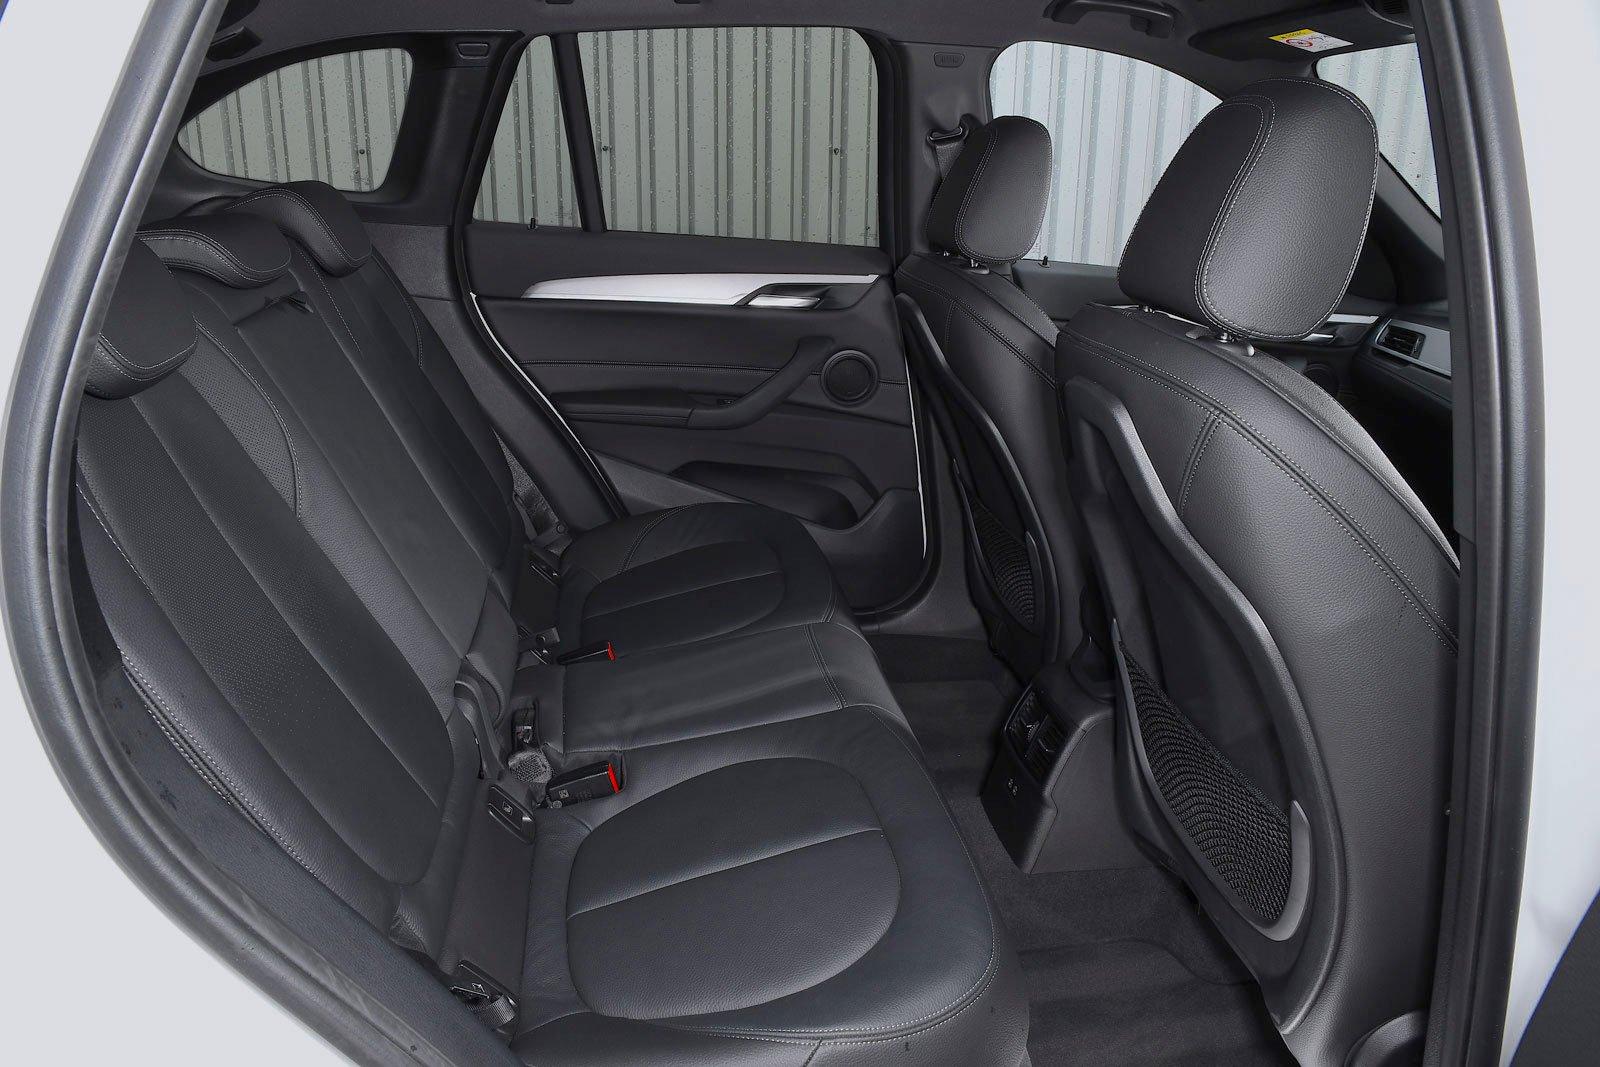 BMW X1 2021 interior rear seats